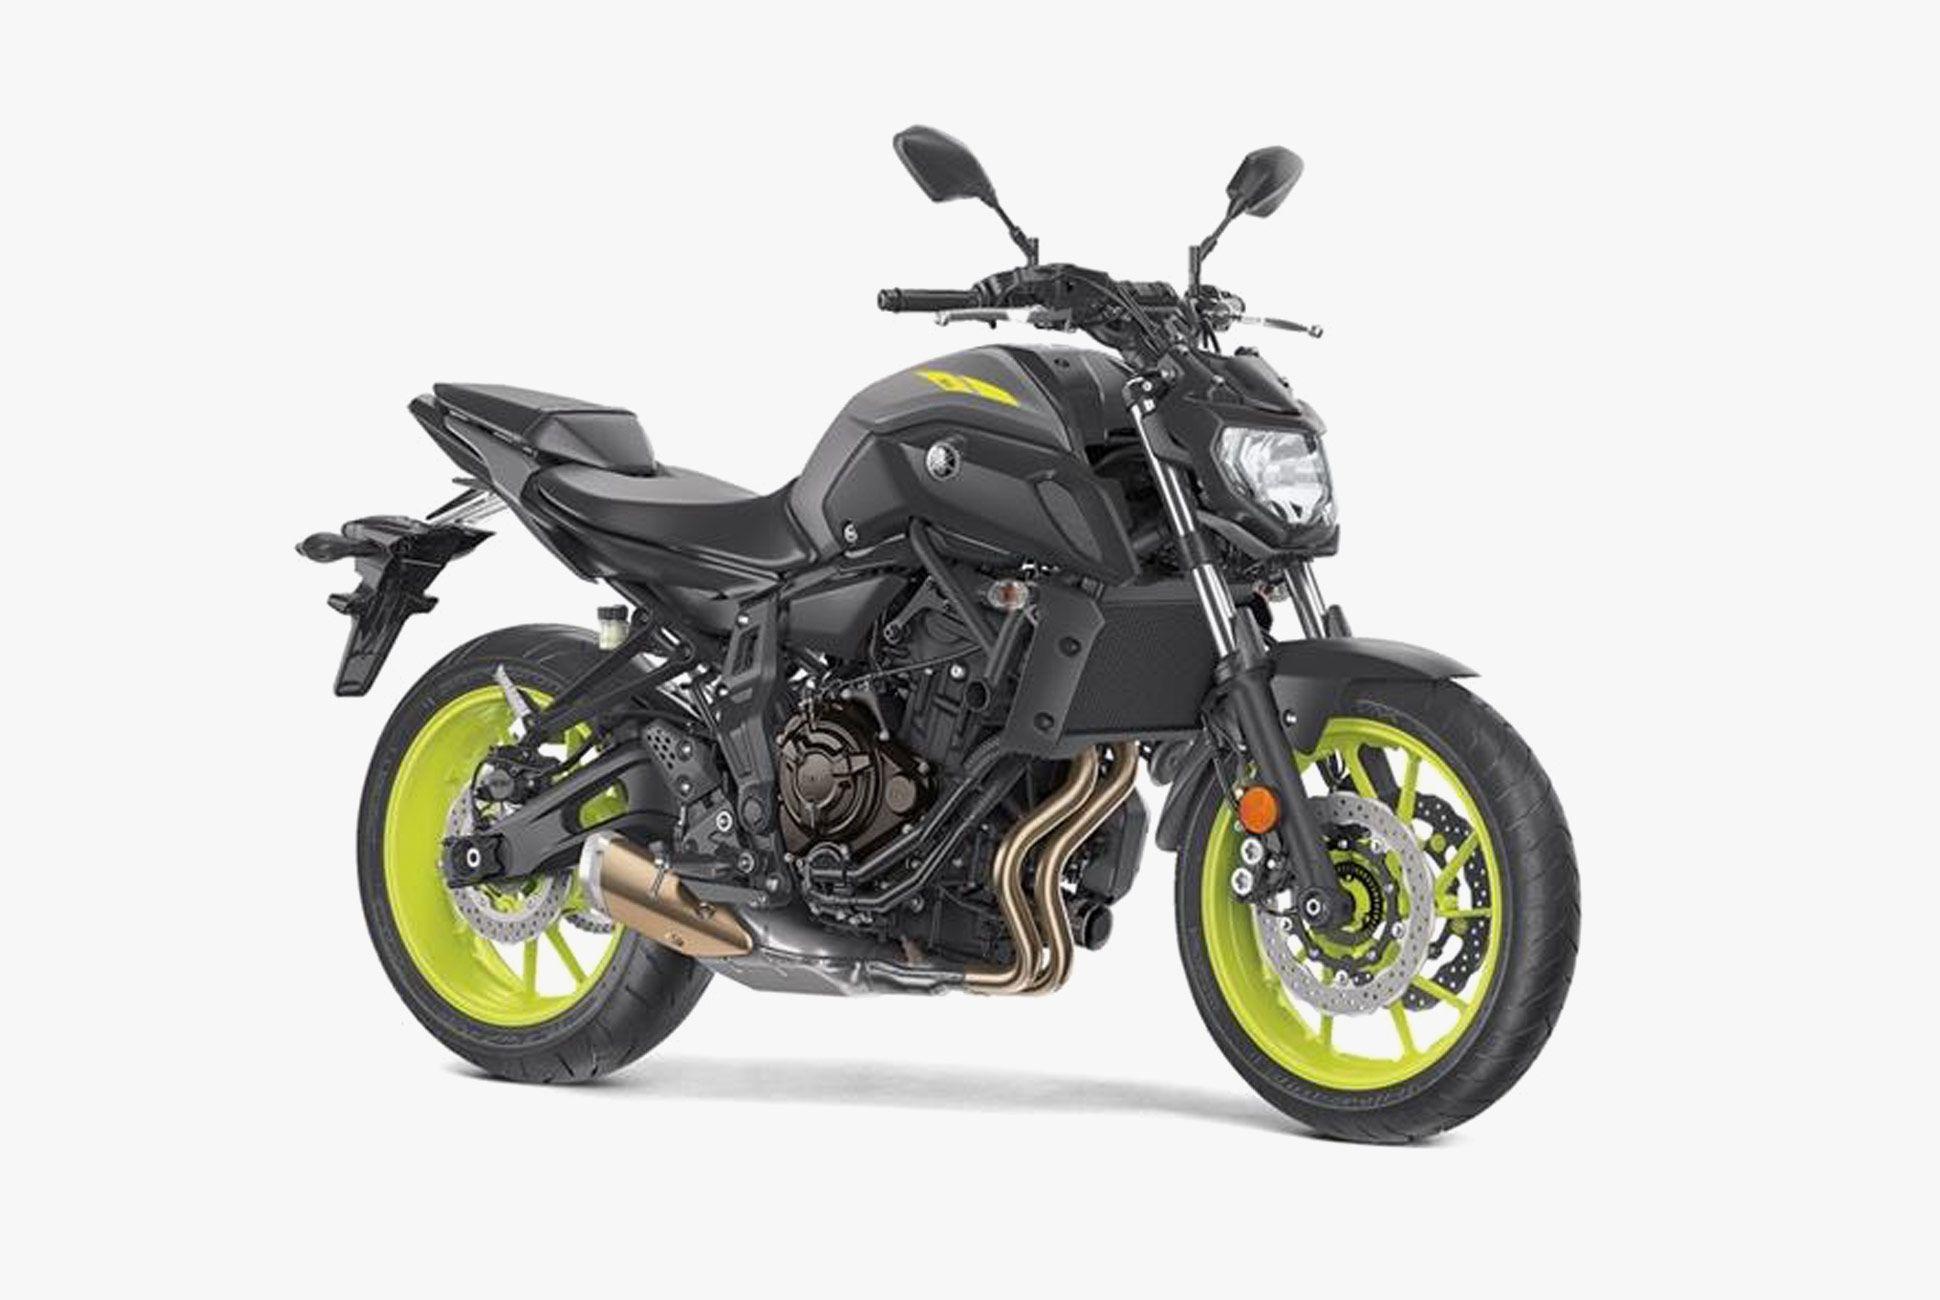 Astounding The 16 Best Motorcycles For Shorter Riders Gear Patrol Spiritservingveterans Wood Chair Design Ideas Spiritservingveteransorg